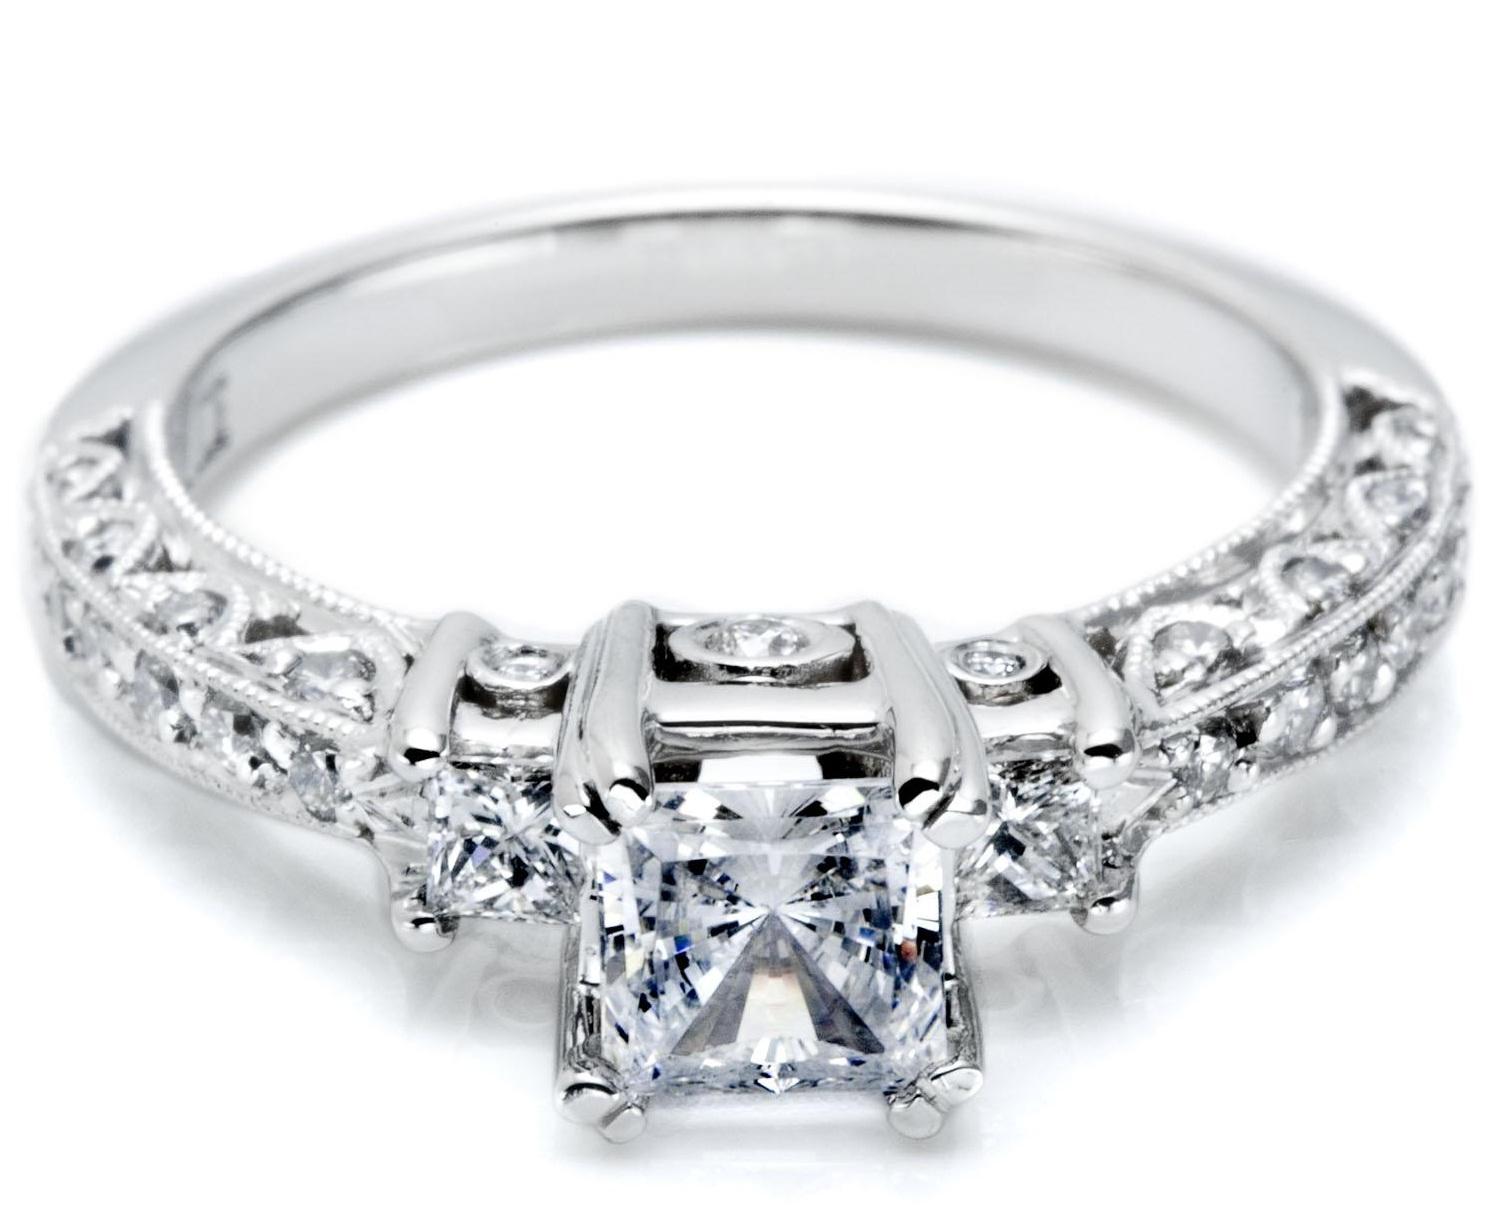 Women Beauty Tips 10 Beautiful Finger Ring Designs For Girls